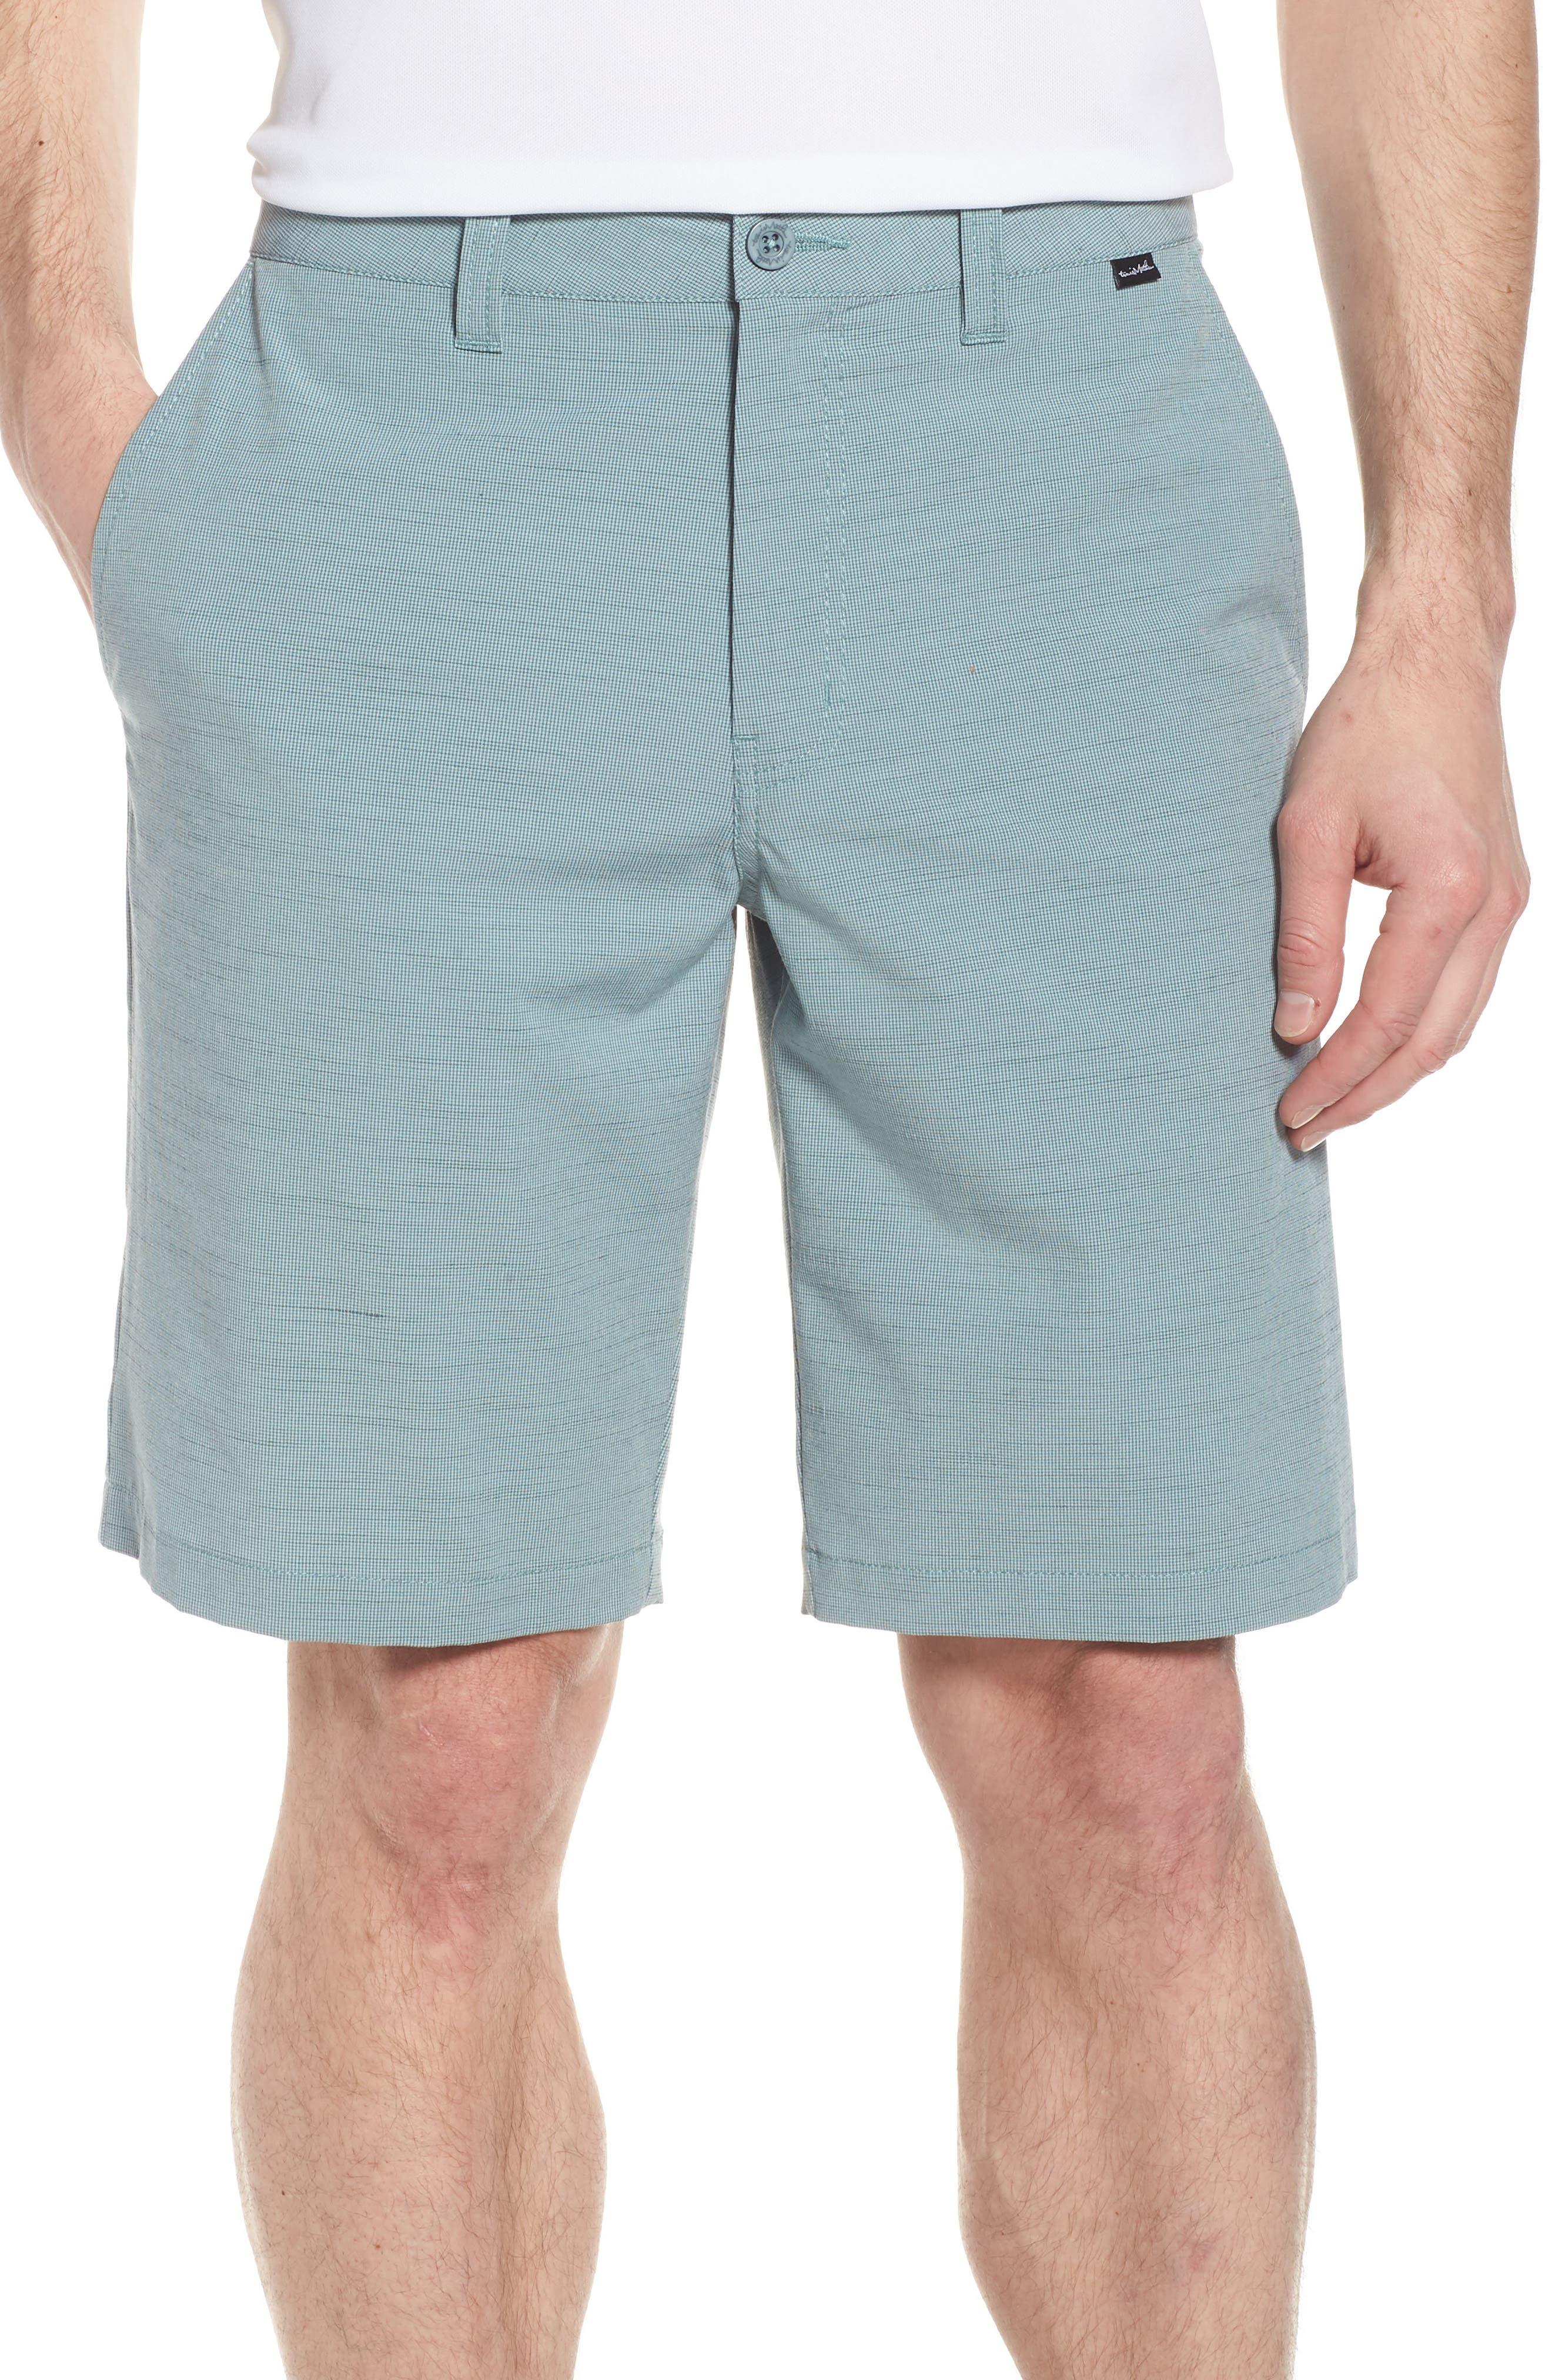 Tulum Stretch Shorts,                         Main,                         color, 300